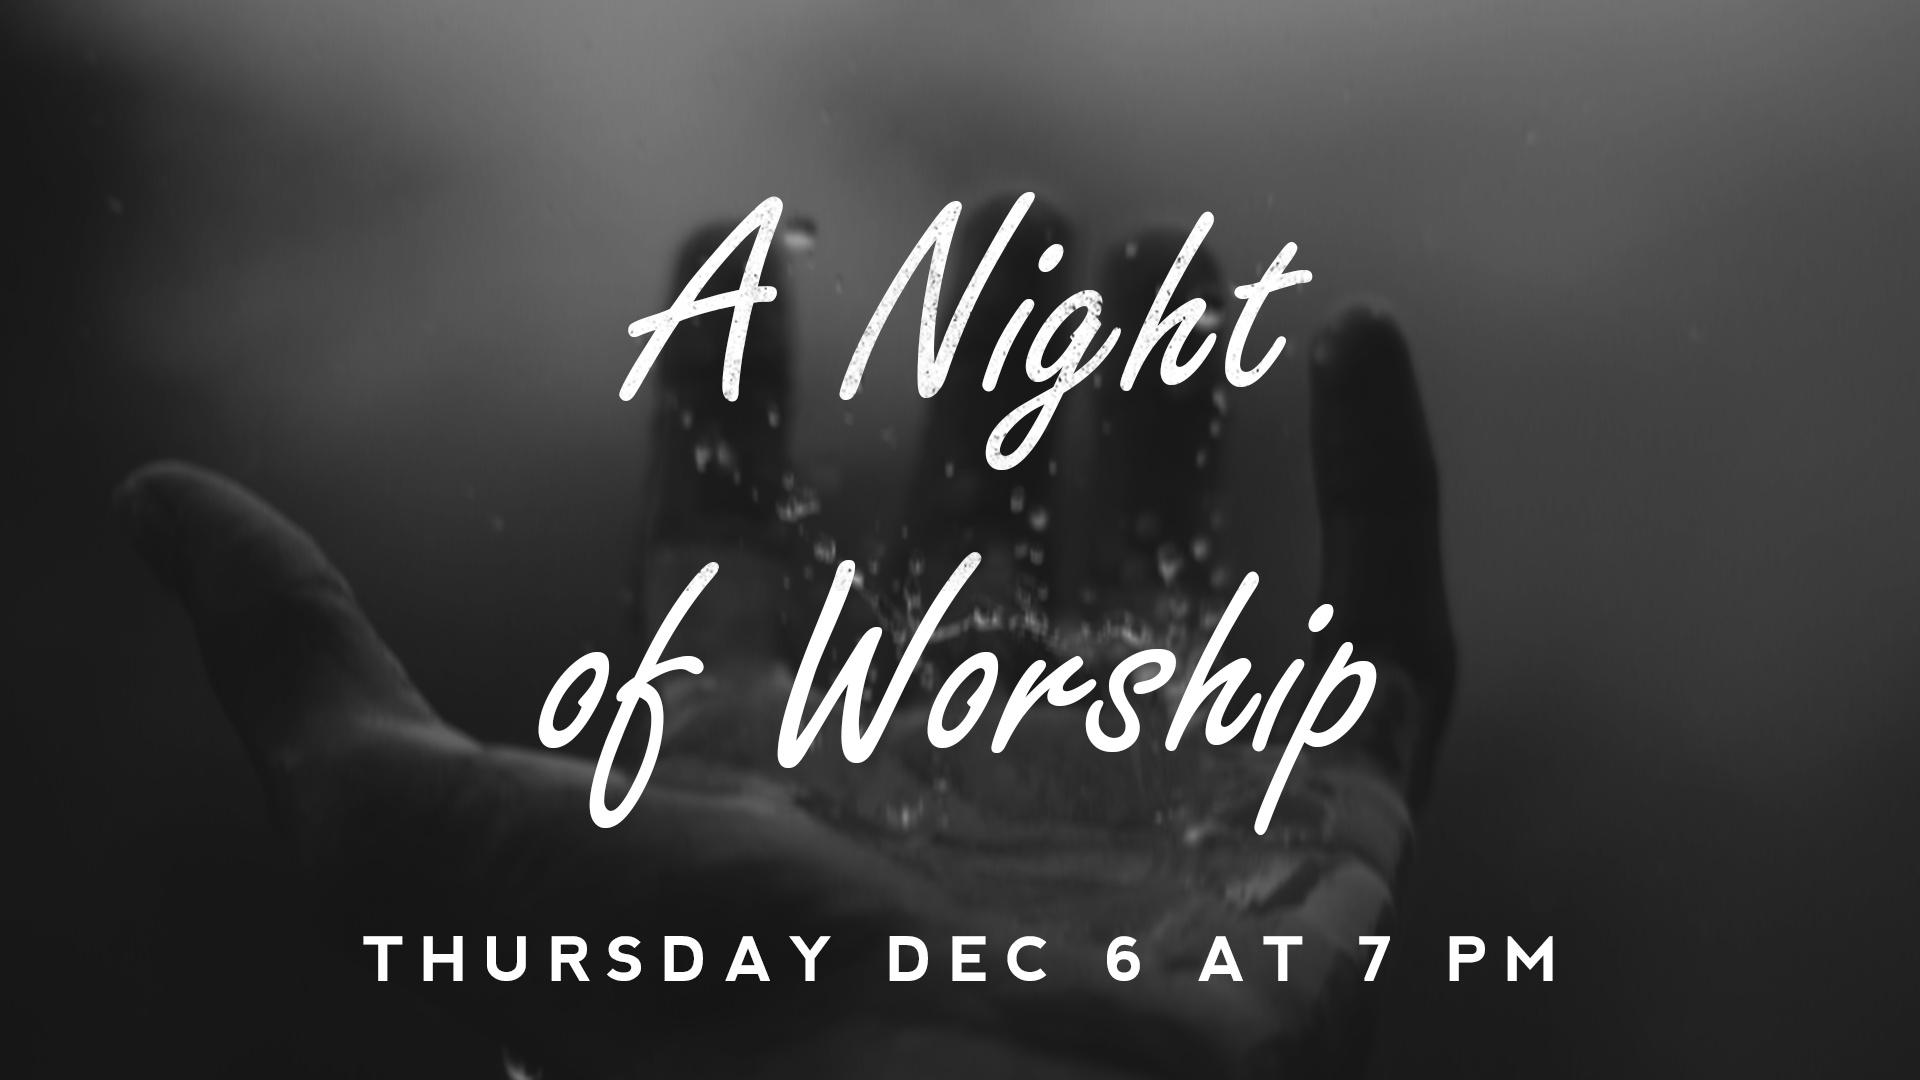 https://0201.nccdn.net/1_2/000/000/17e/001/worship-night-1920x1080.jpg